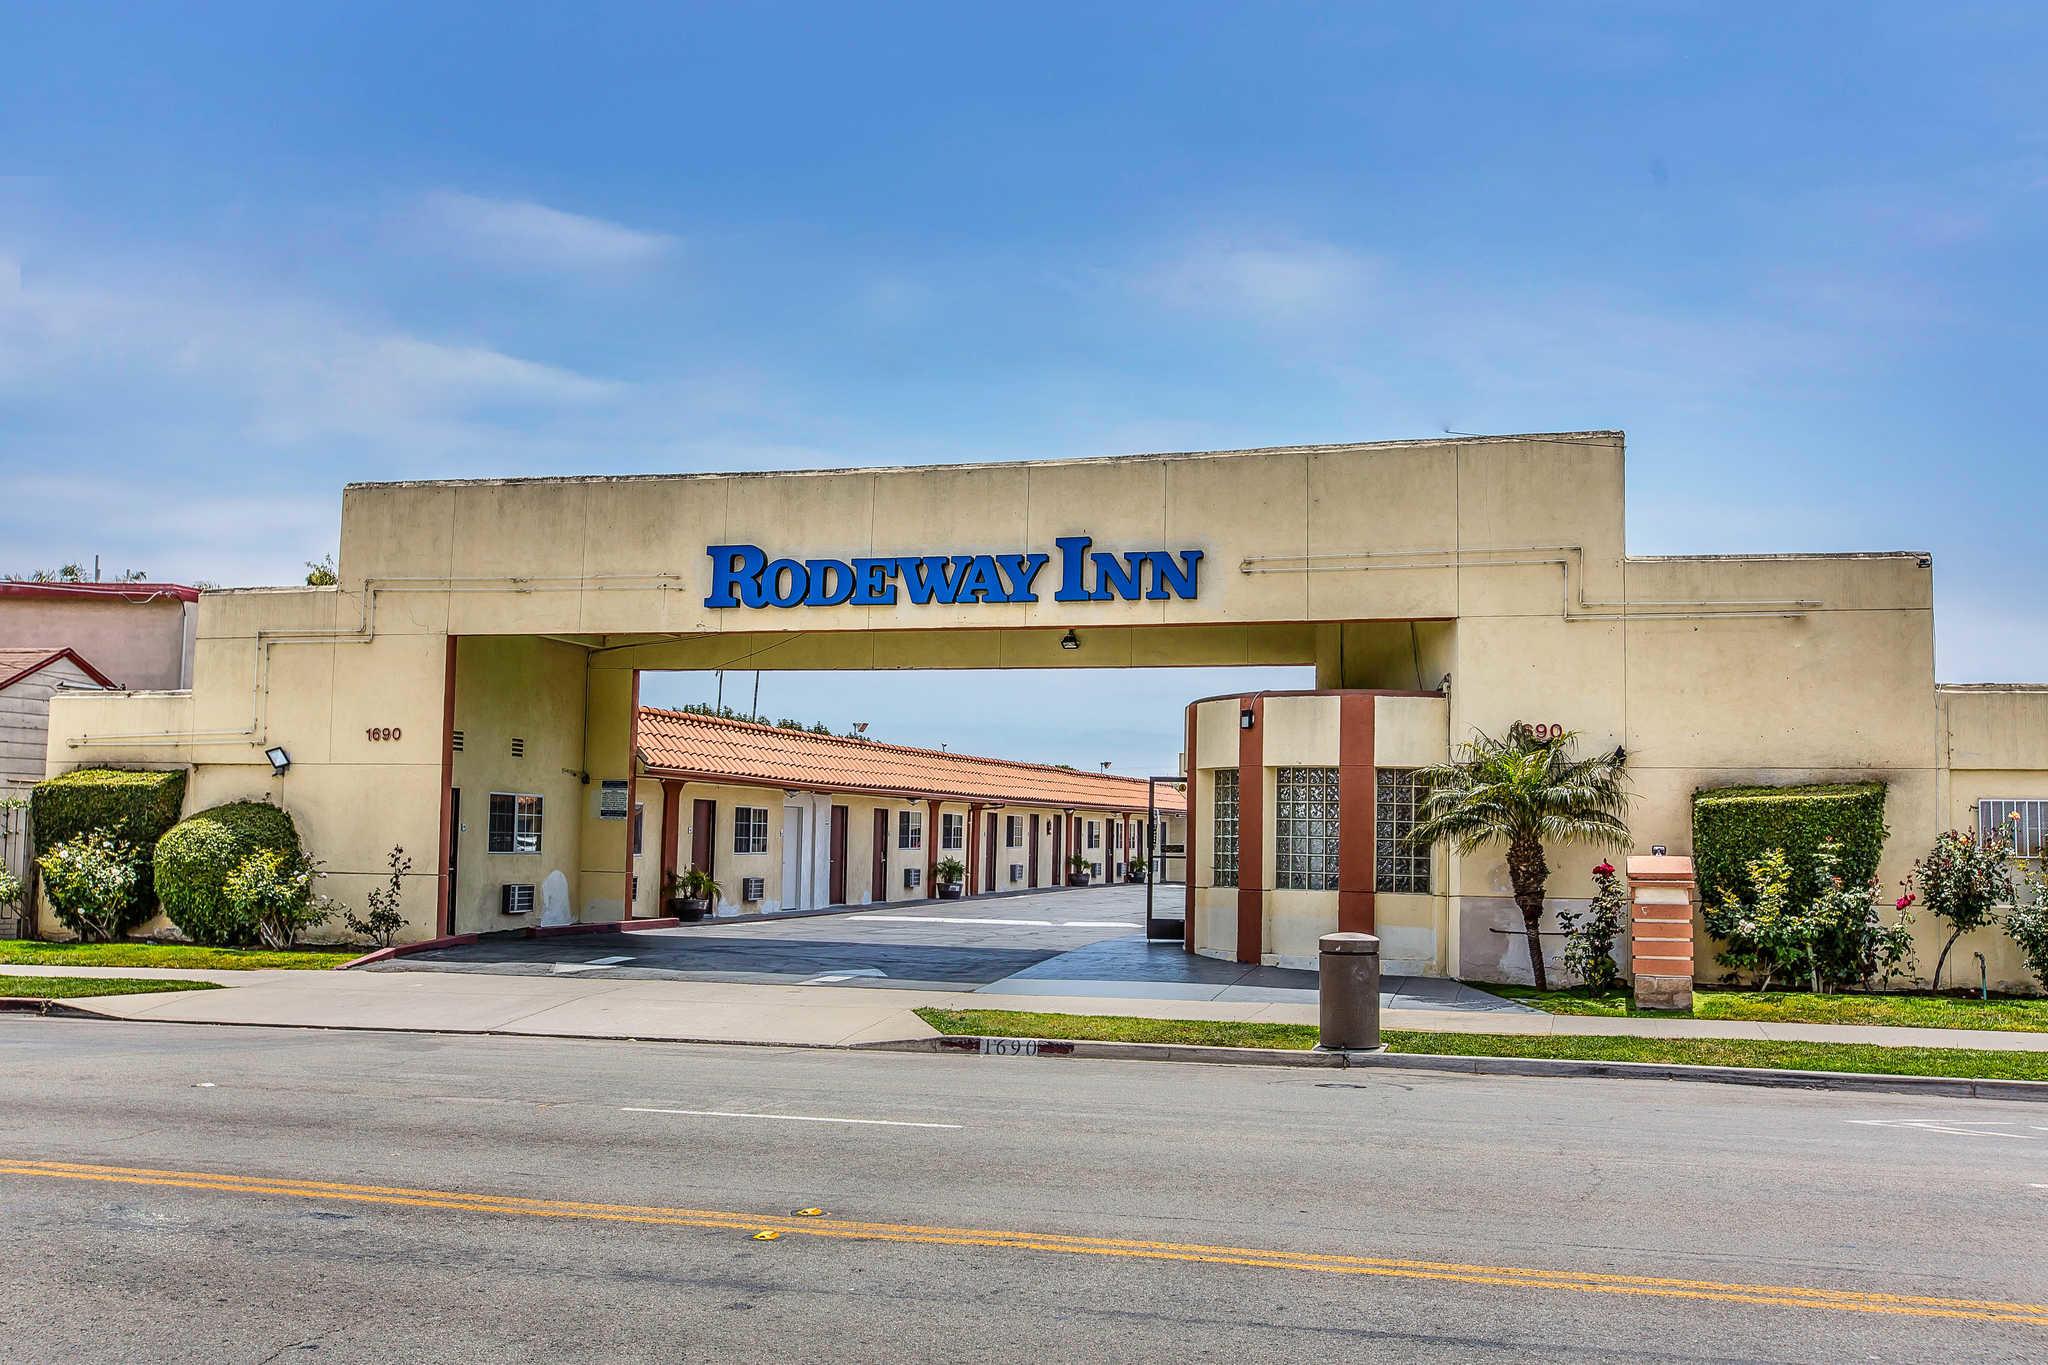 Rodeway Inn, Ventura California (CA) - LocalDatabase.com